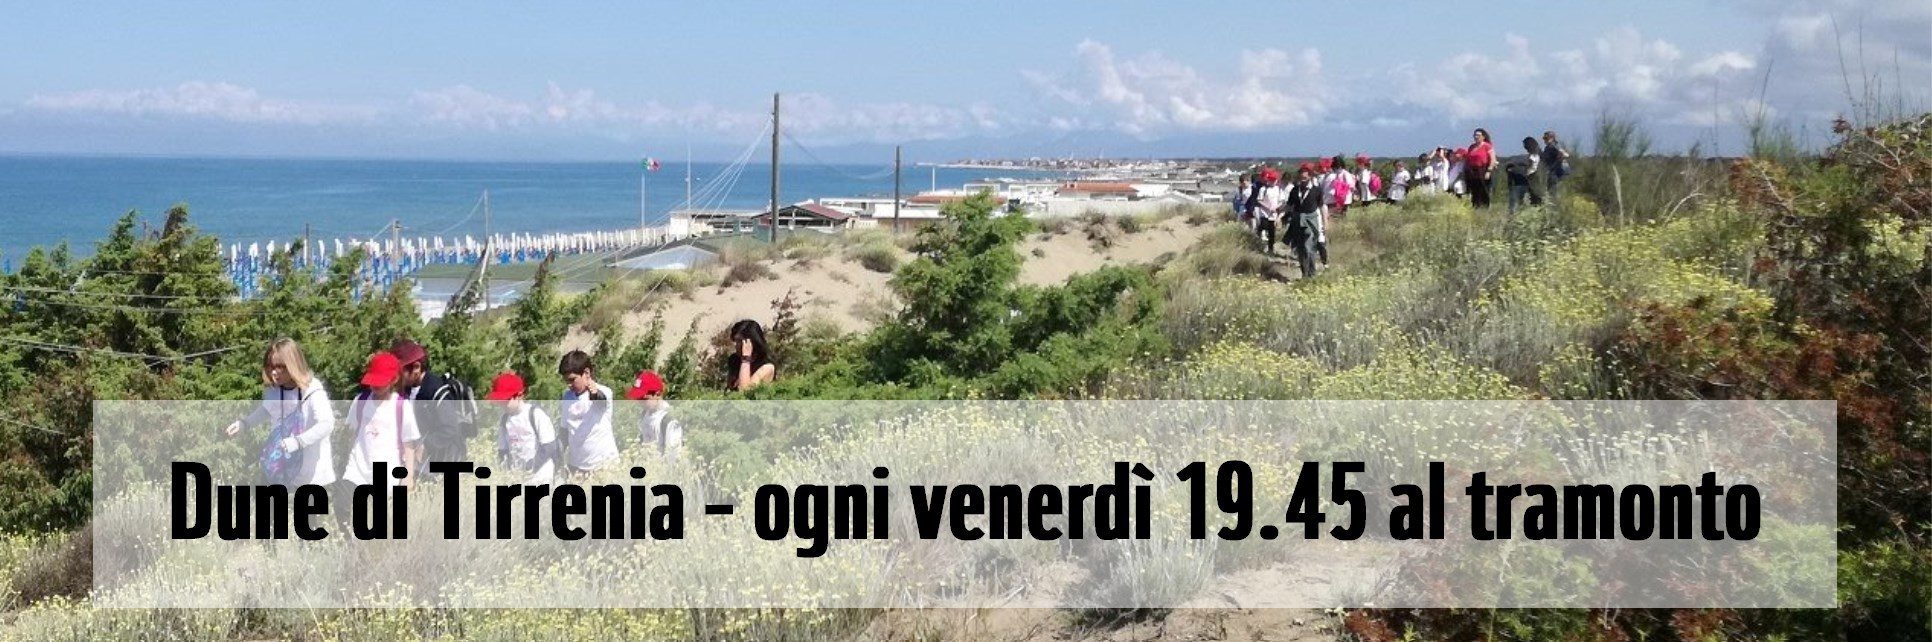 Visite guidate in agosto all'Oasi WWF Dune di Tirrenia | Pisa